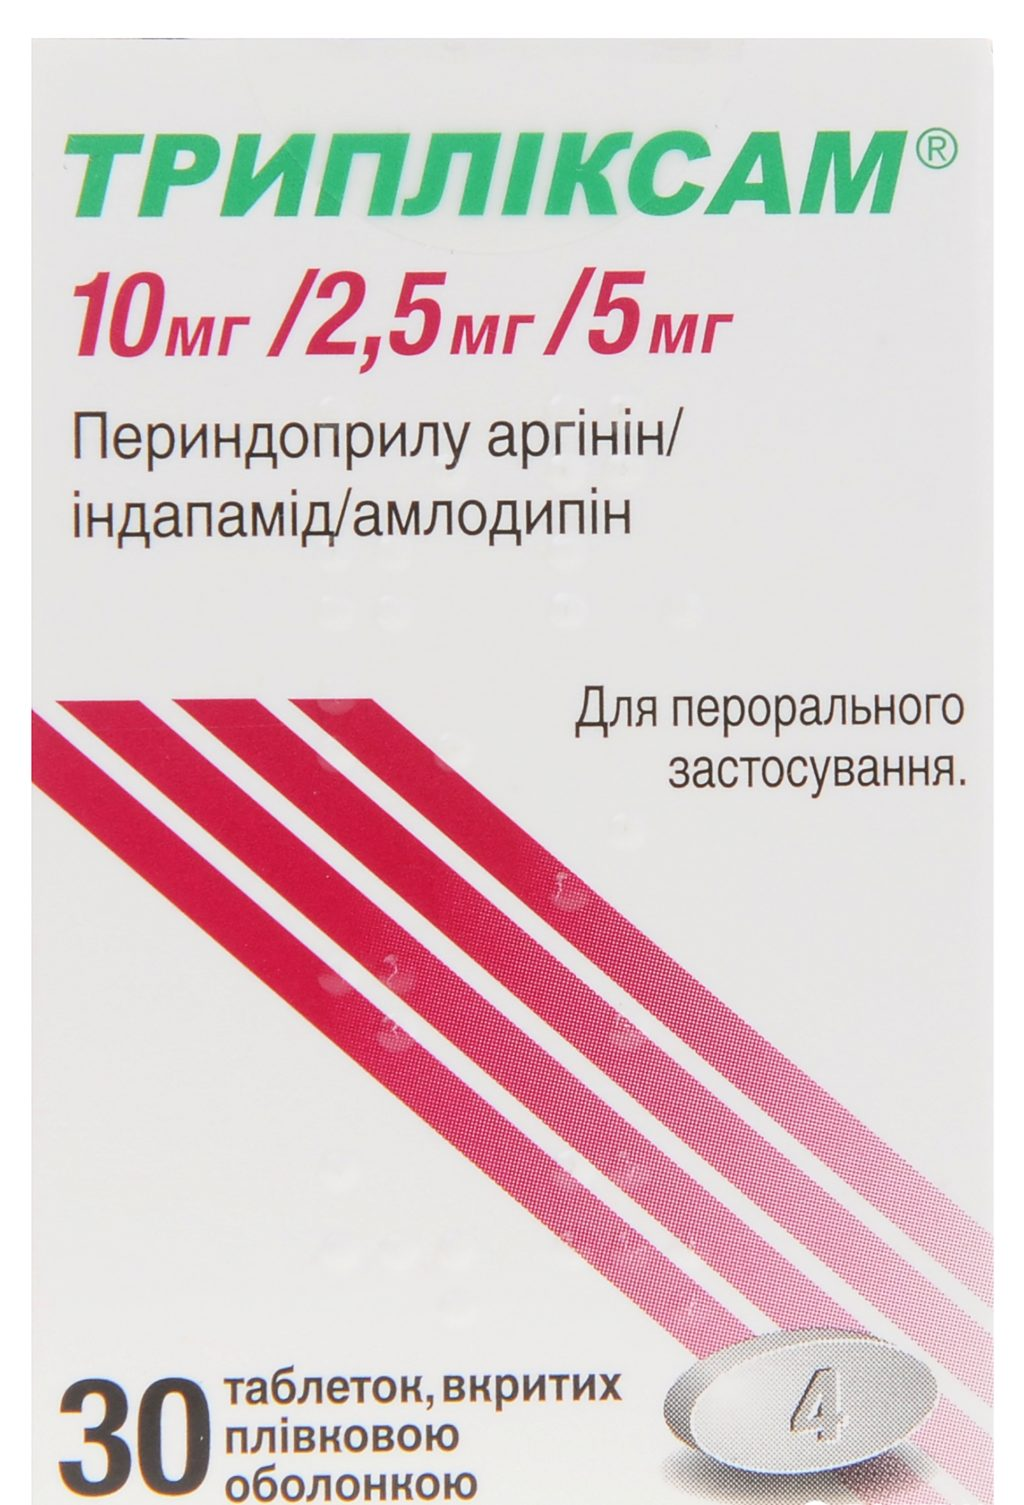 LAVESTRA H 50 mg/12,5 mg filmtabletta